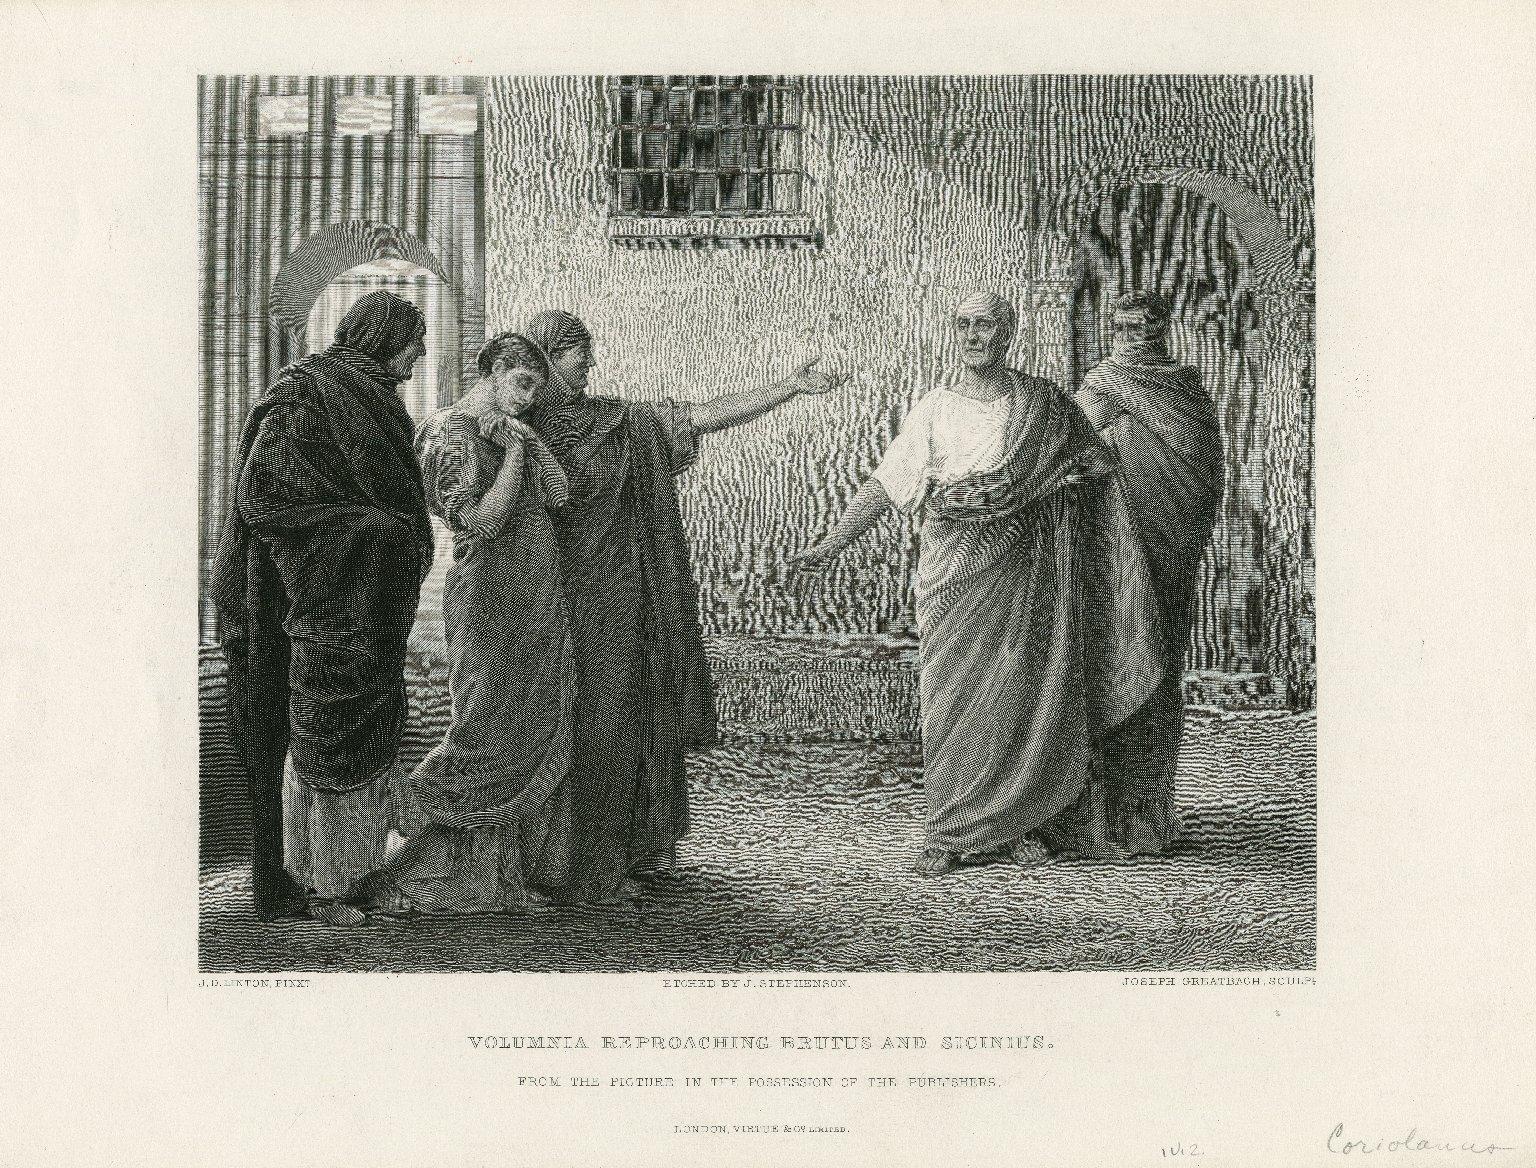 Volumnia reproaching Brutus and Sicinius [in Coriolanus, act IV, scene 2] [graphic] / J. D. Linton, pinxt. ; etched by J. Stephenson ; Joseph Greatbach, sculpt.